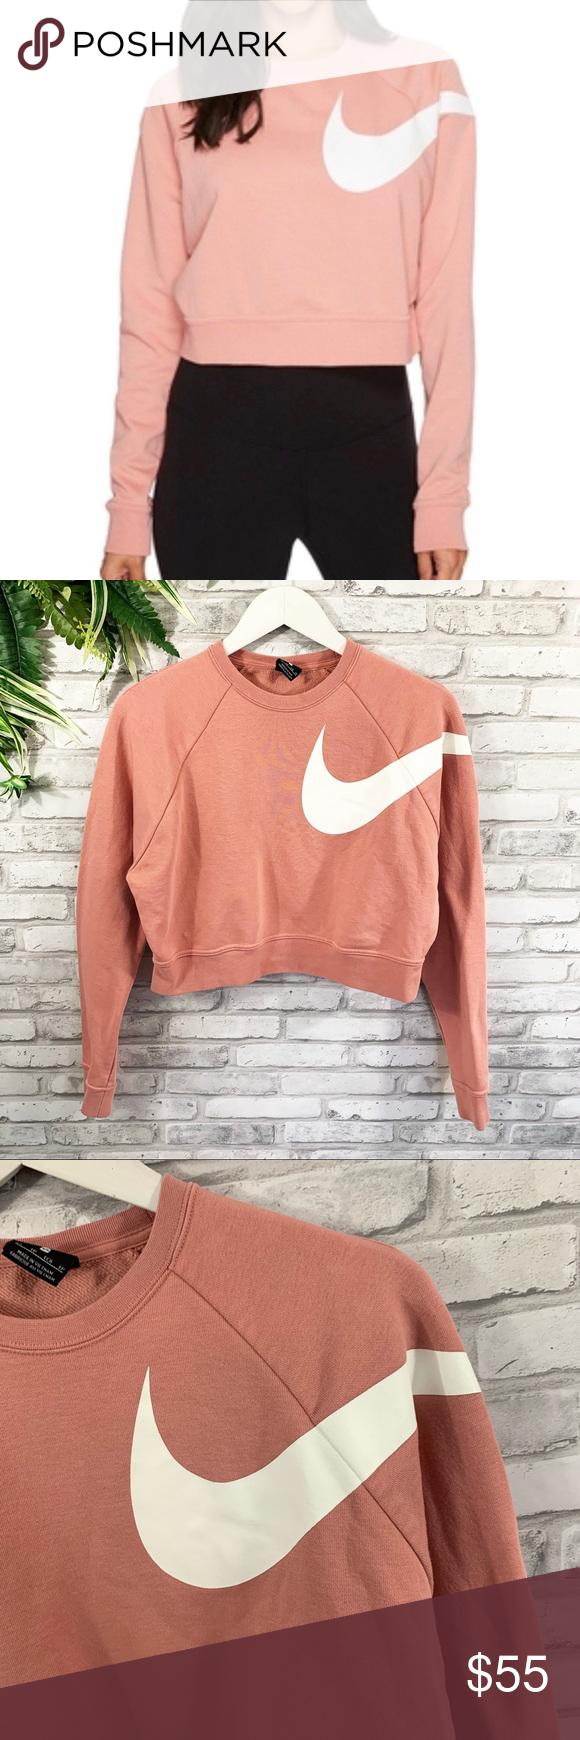 Nike Versa Pink Cropped Big Swoosh Sweatshirt Sweaters For Women Sweatshirts Crew Neck Sweater [ 1740 x 580 Pixel ]